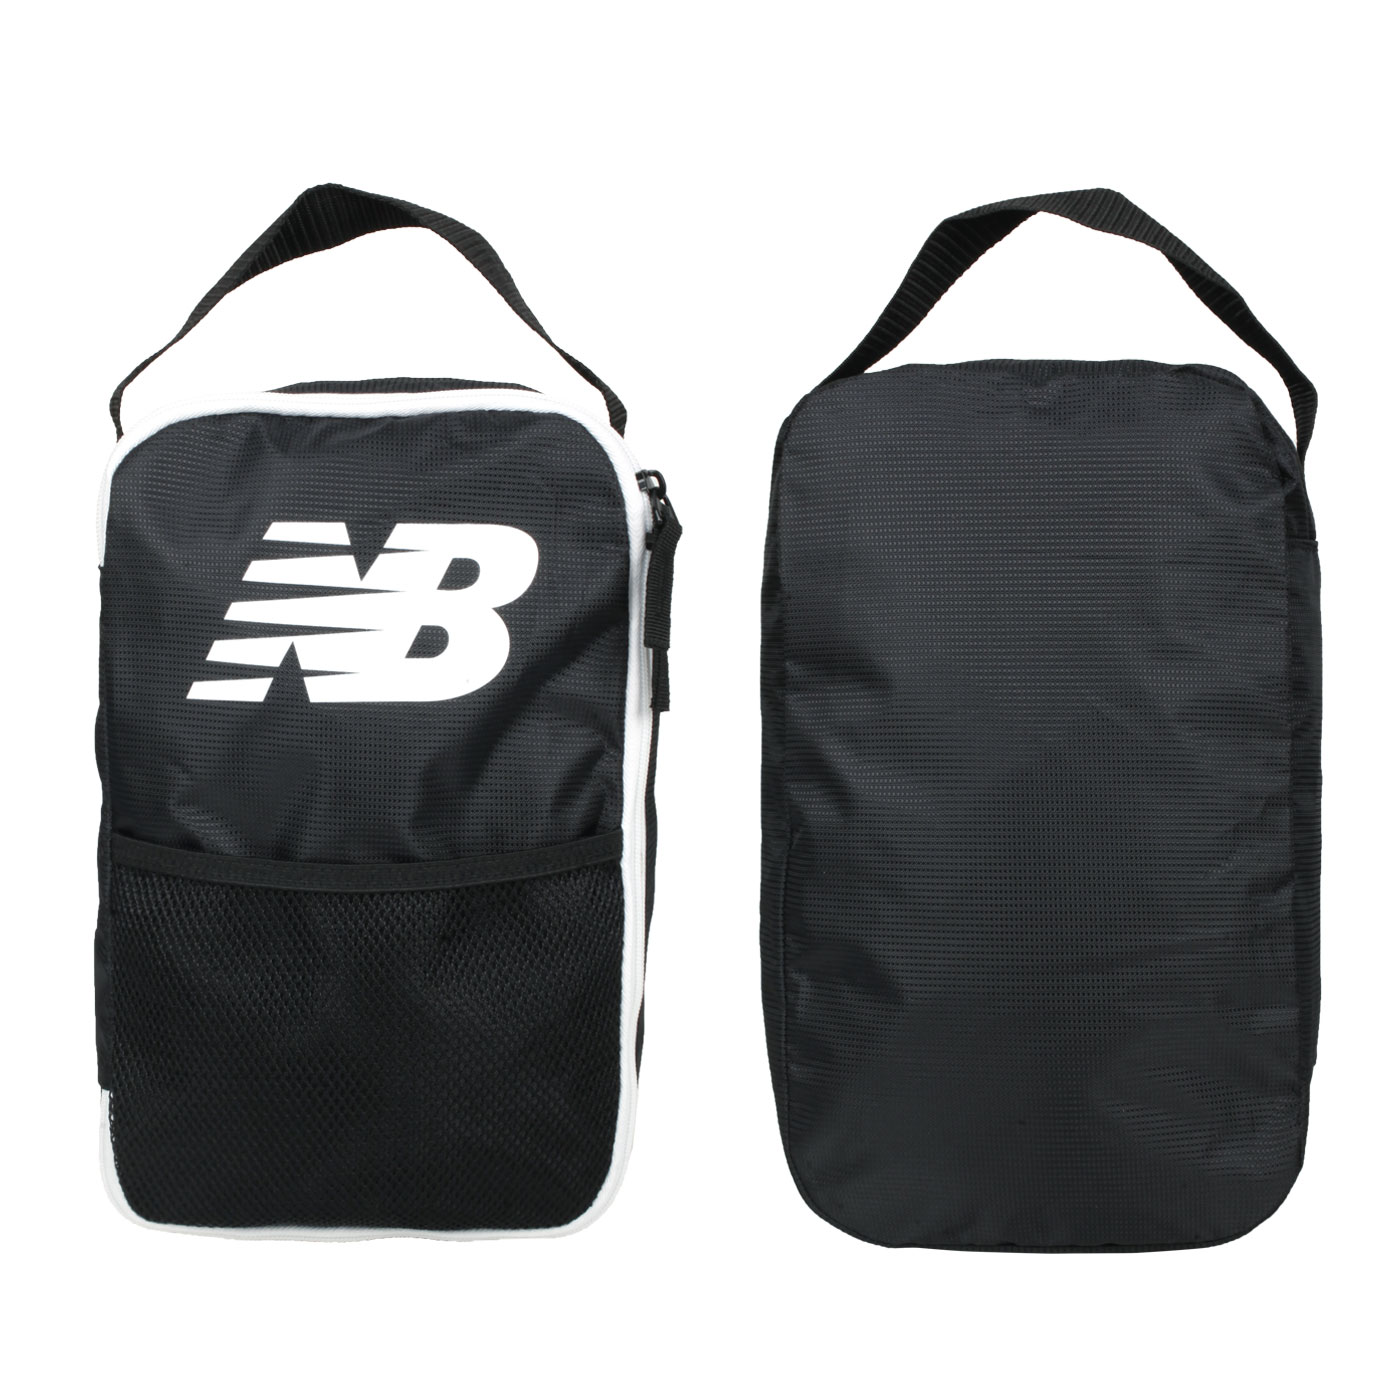 NEW BALANCE 鞋袋 LAB13149BK